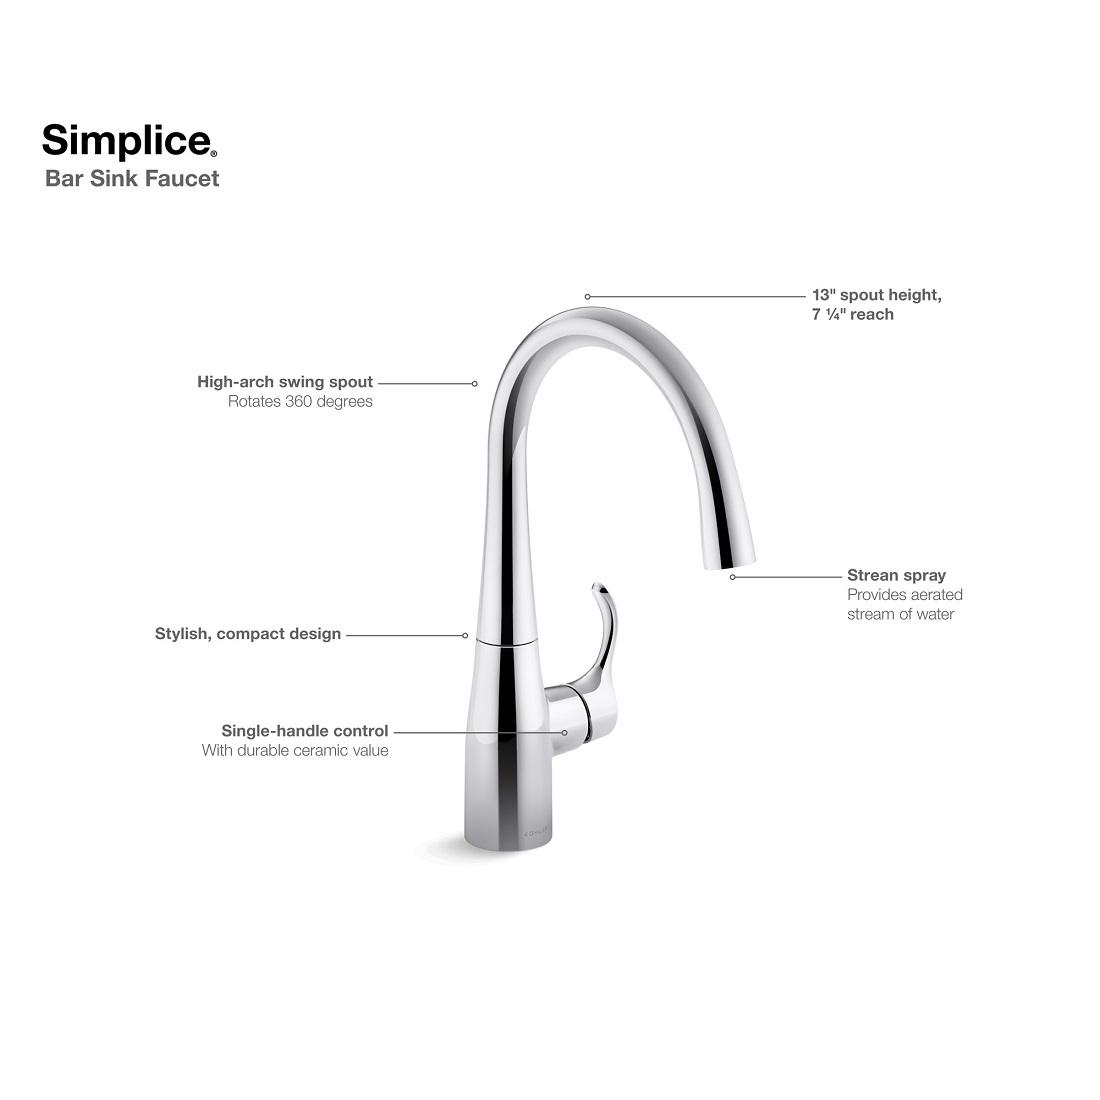 Kohler Simplice Single Handle Bar Faucet In Vibrant